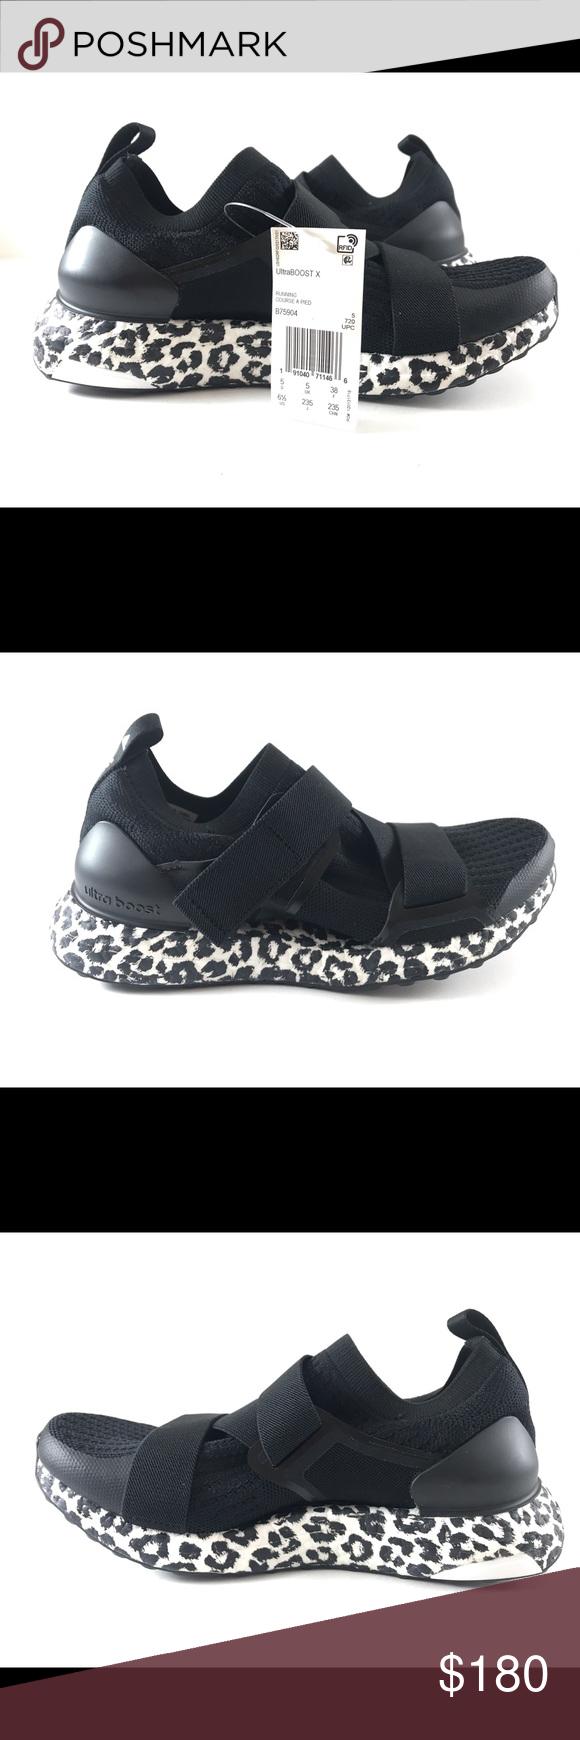 new styles 2a3ed 872ac Adidas Stella McCartney Utraboost X Running Shoes Adidas by ...